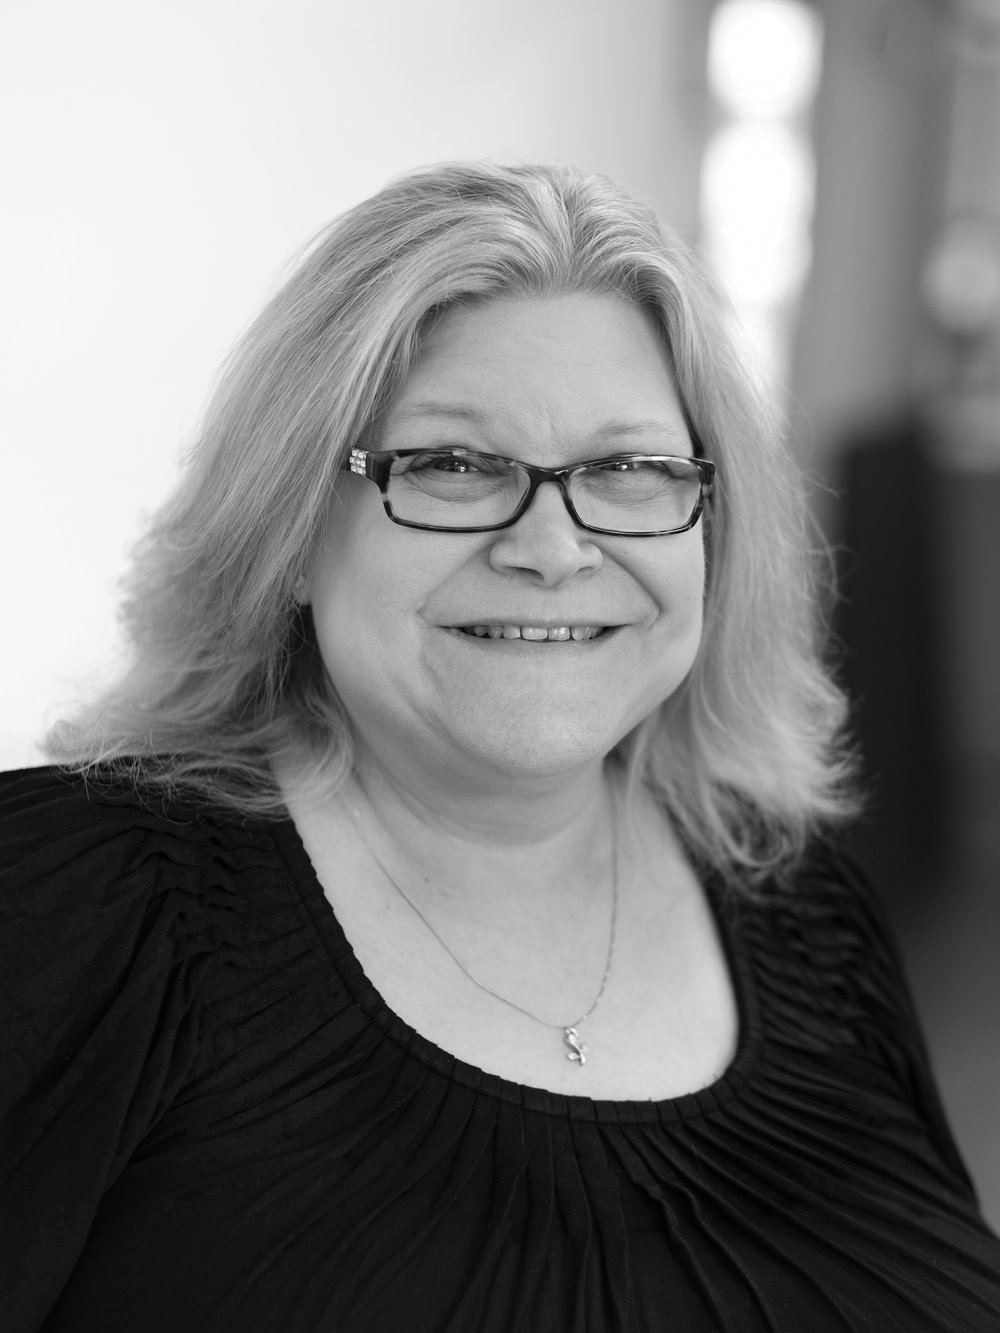 Laurie Kutoroff, Director, Finance & Operations